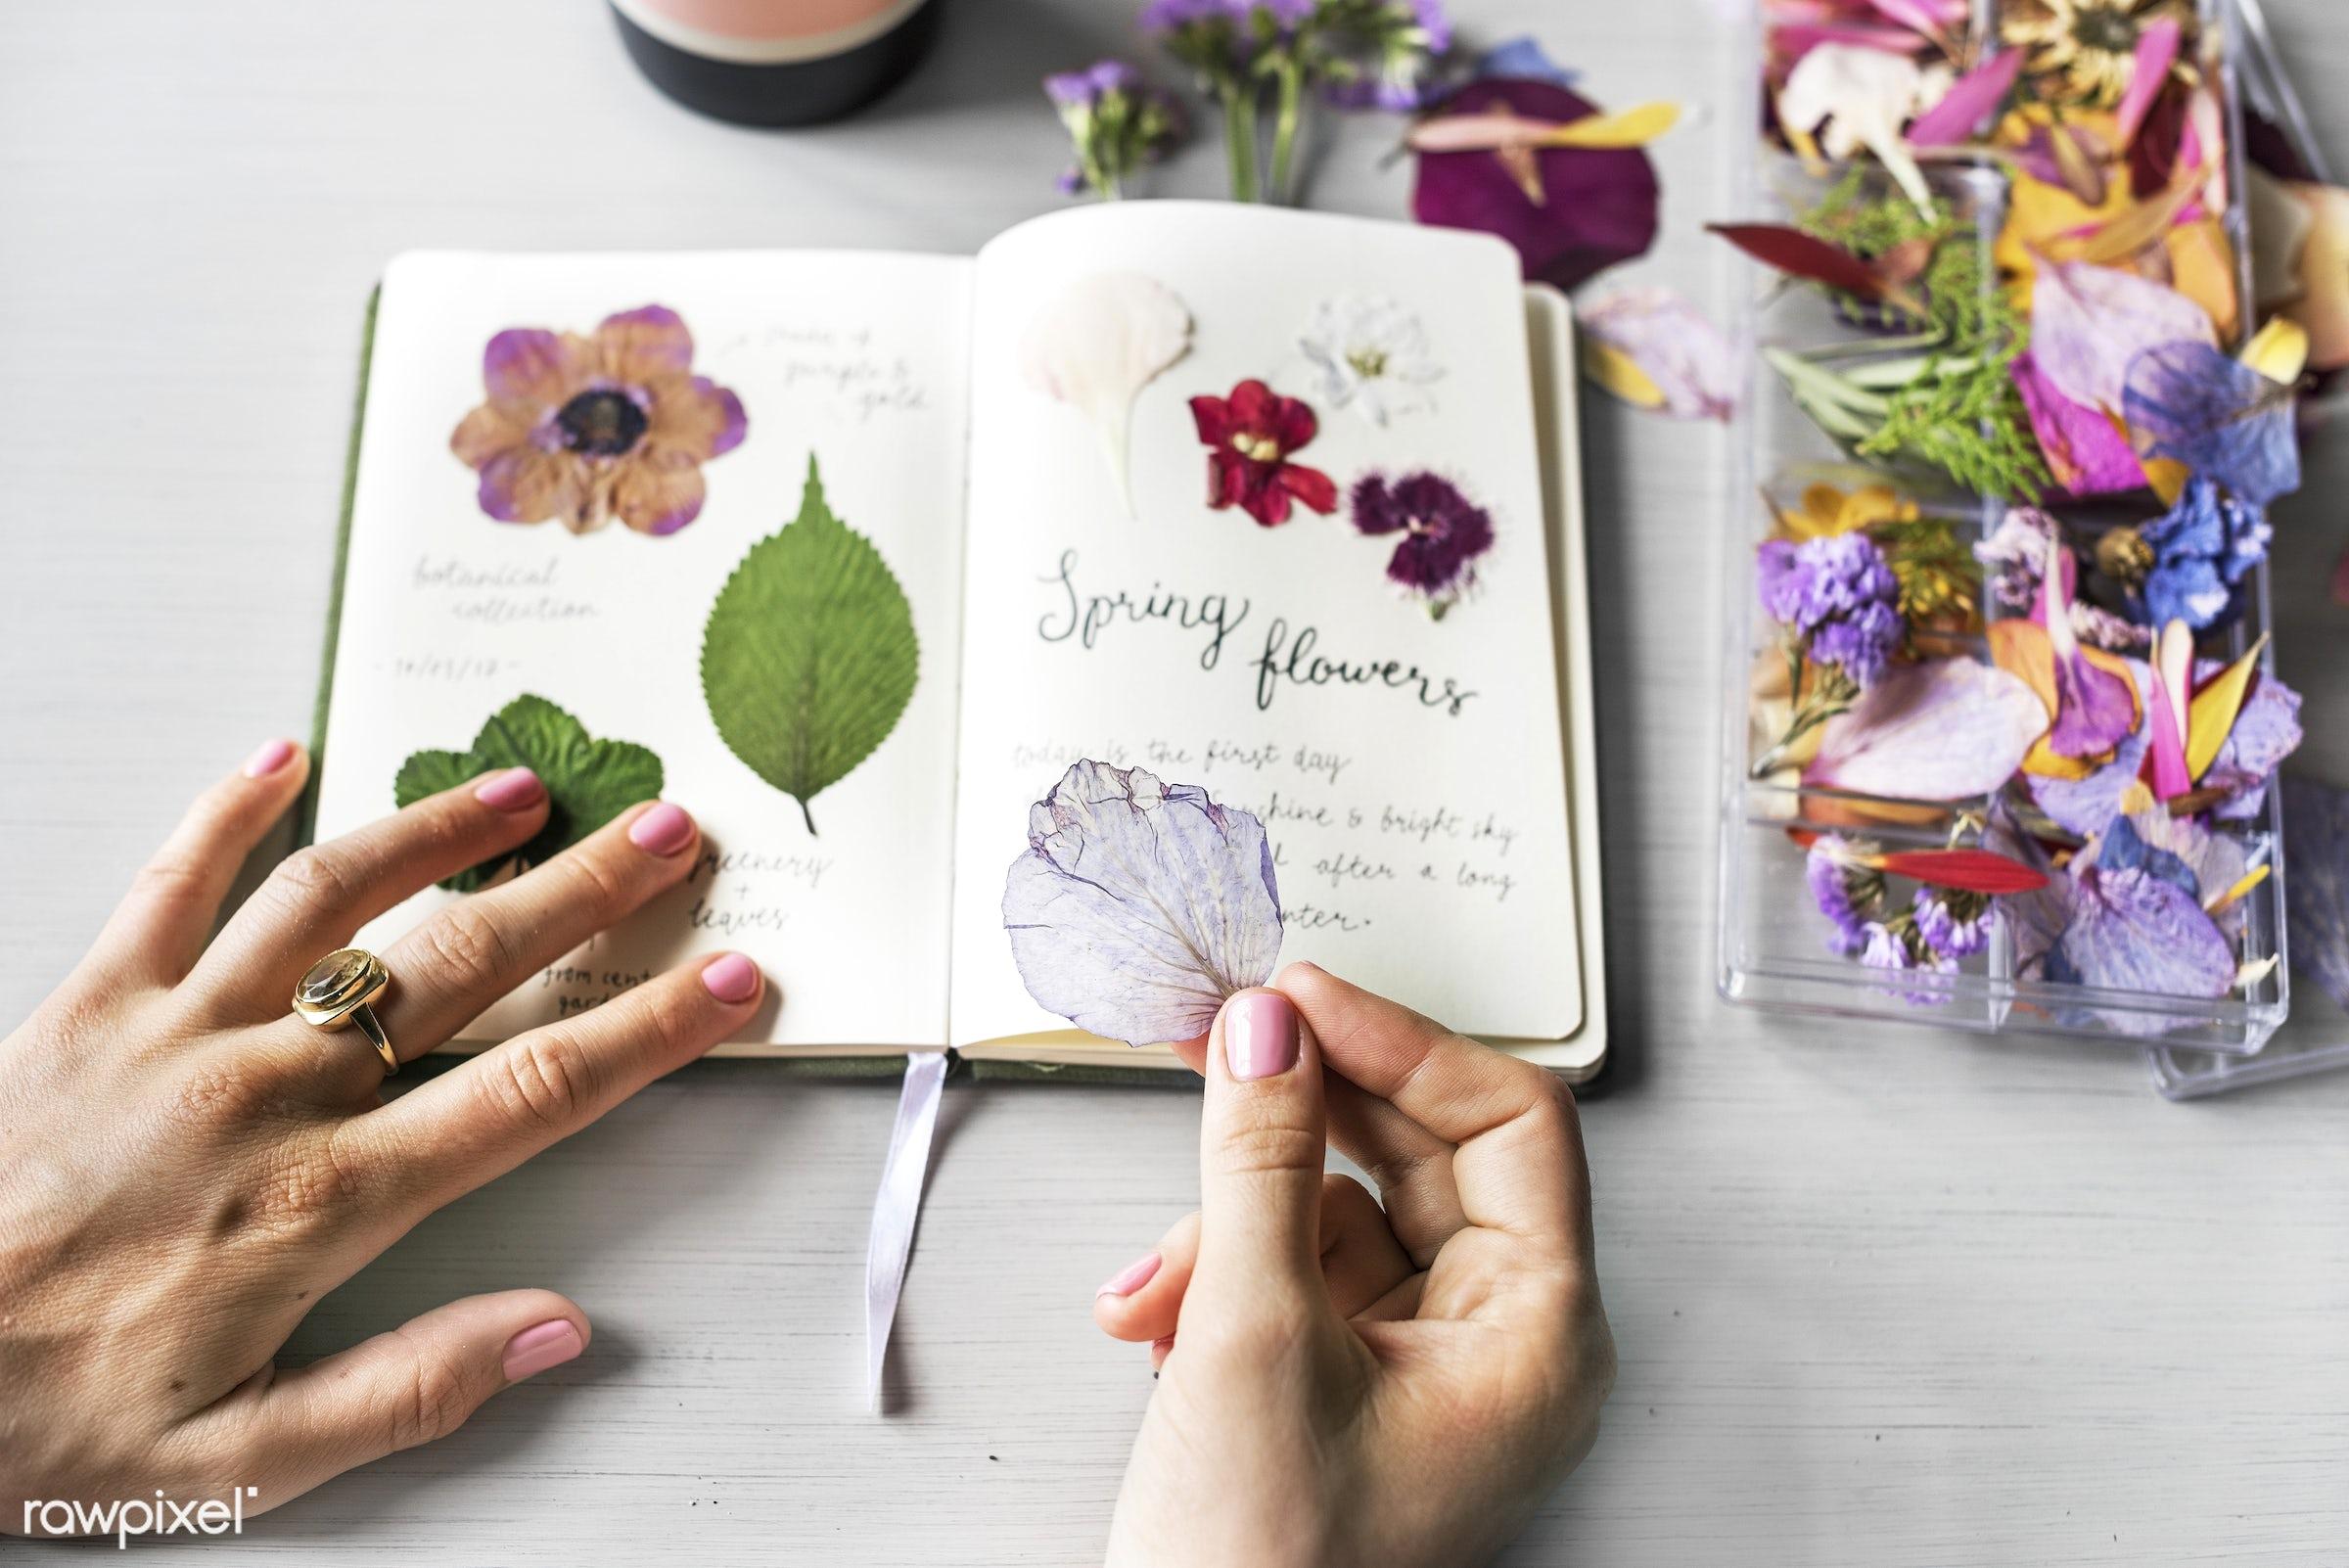 old, diary, decorative, botany, set, album, plants, botanic, collection, leaf, romance, spring, nature, fresh, flower, wild...